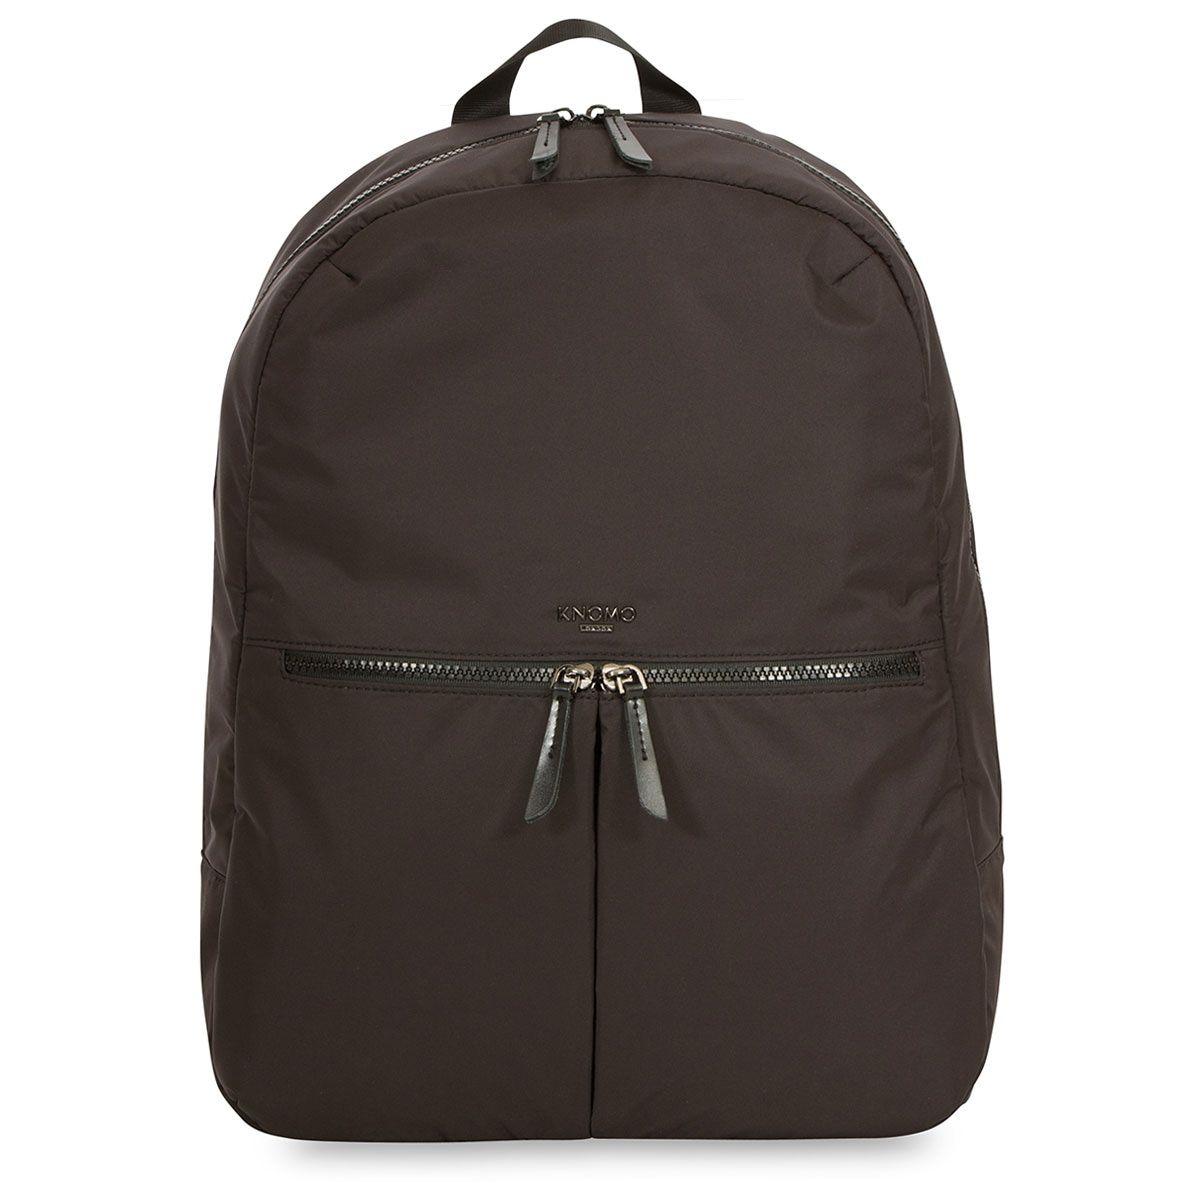 Laptoptas Knomo Berlin Backpack Black 15 inch